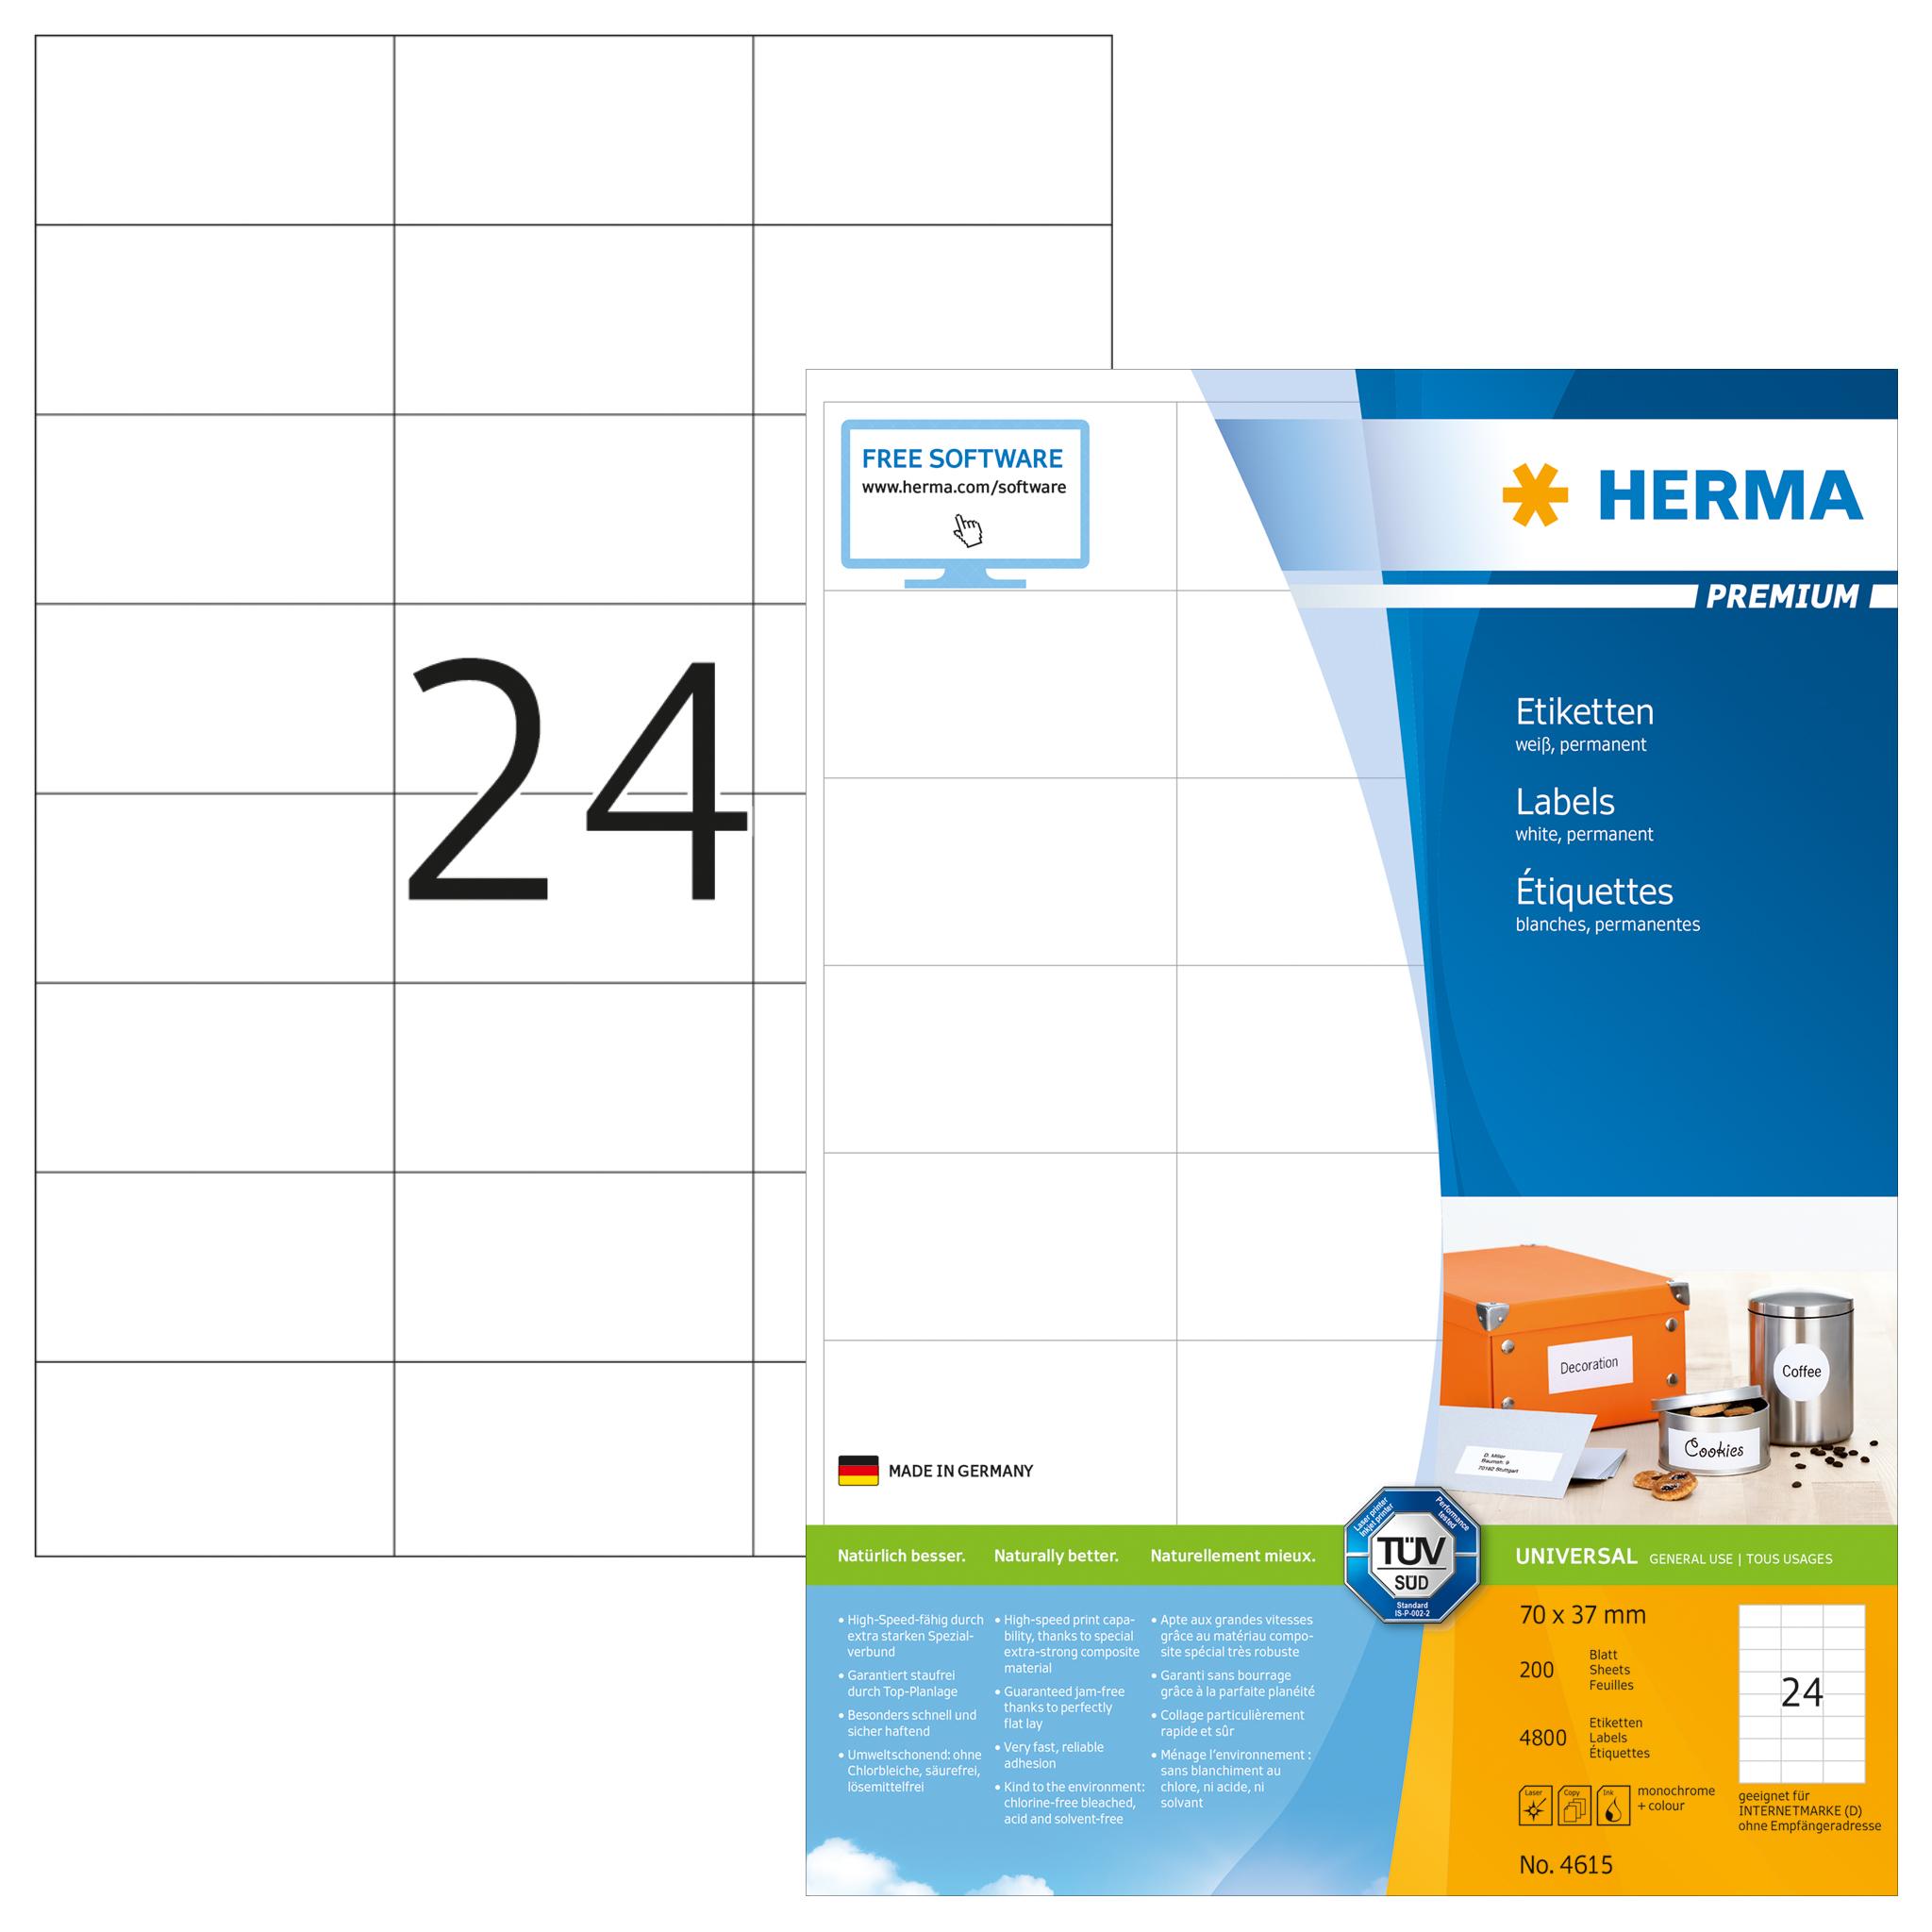 Herma Labels film silver 63,5x29,6 SuperPrint LaserCopy